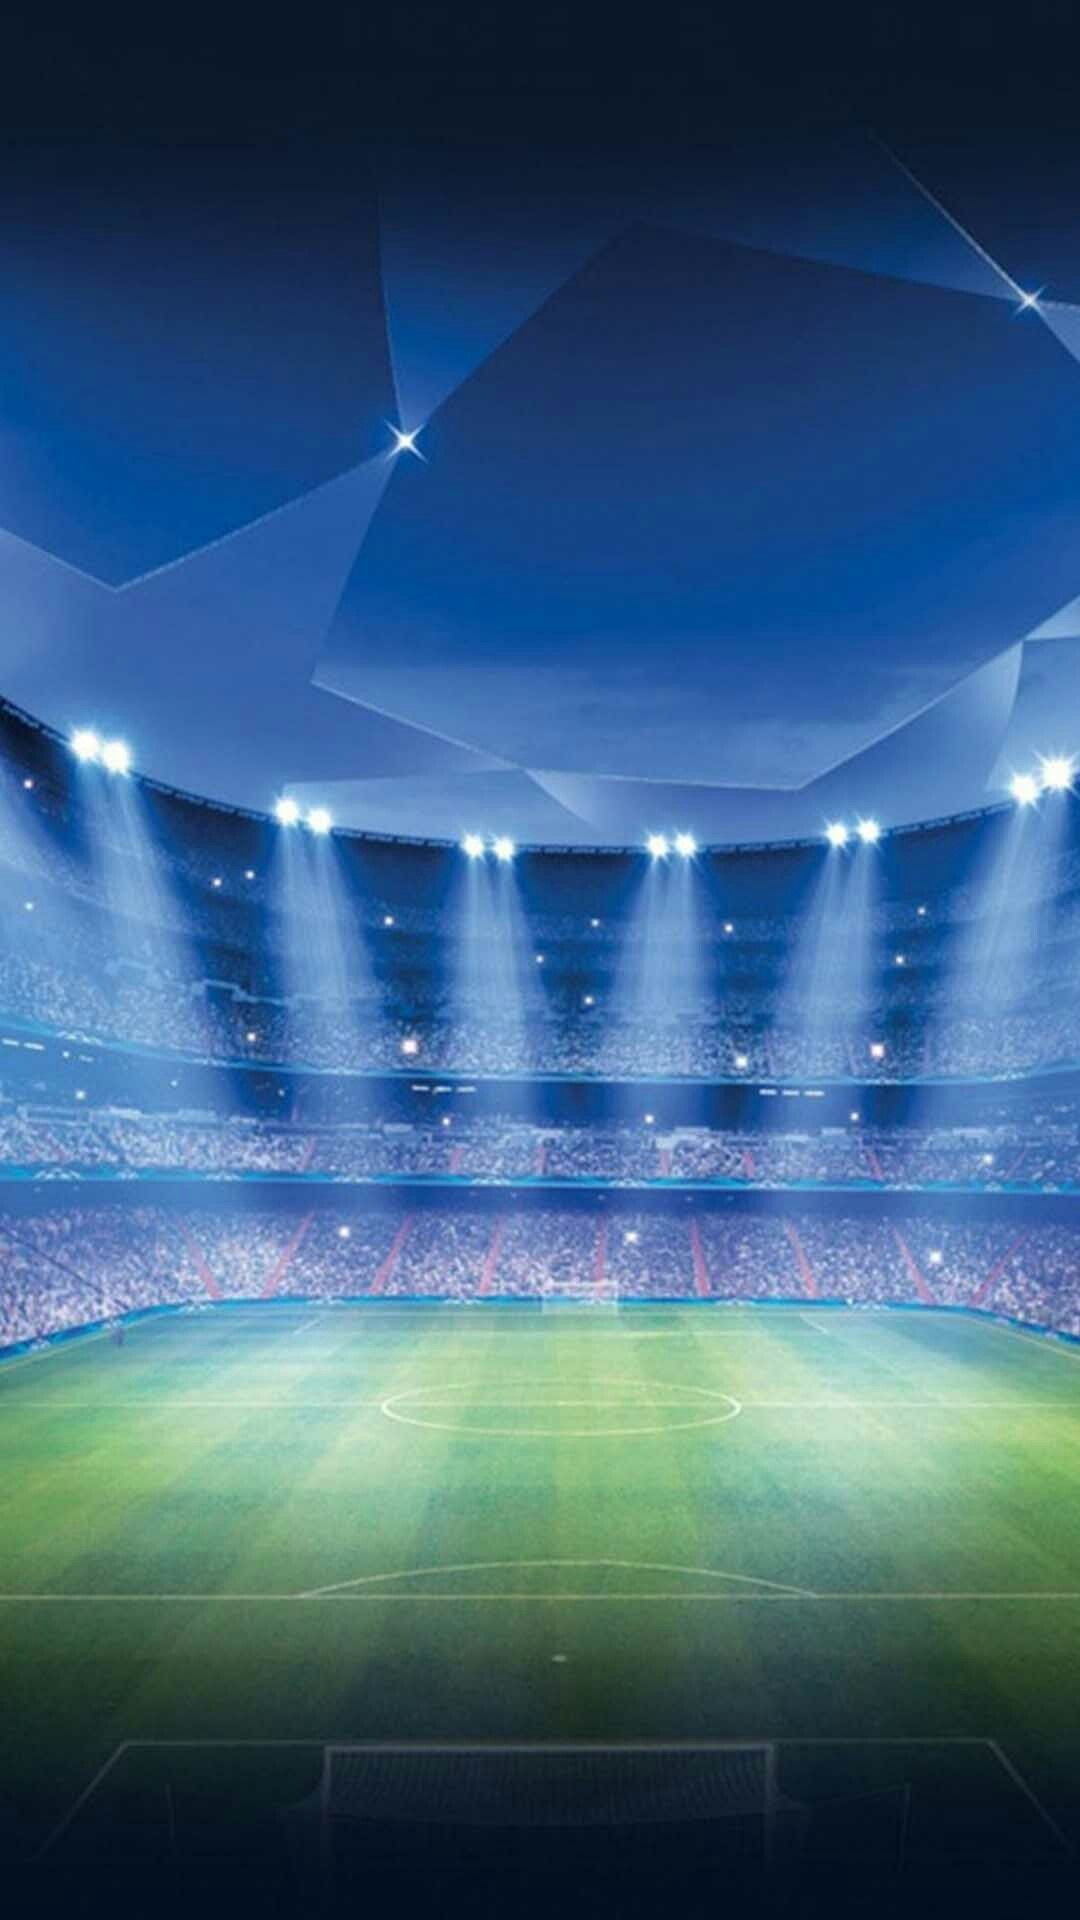 Football Pitch Wallpaper Hd